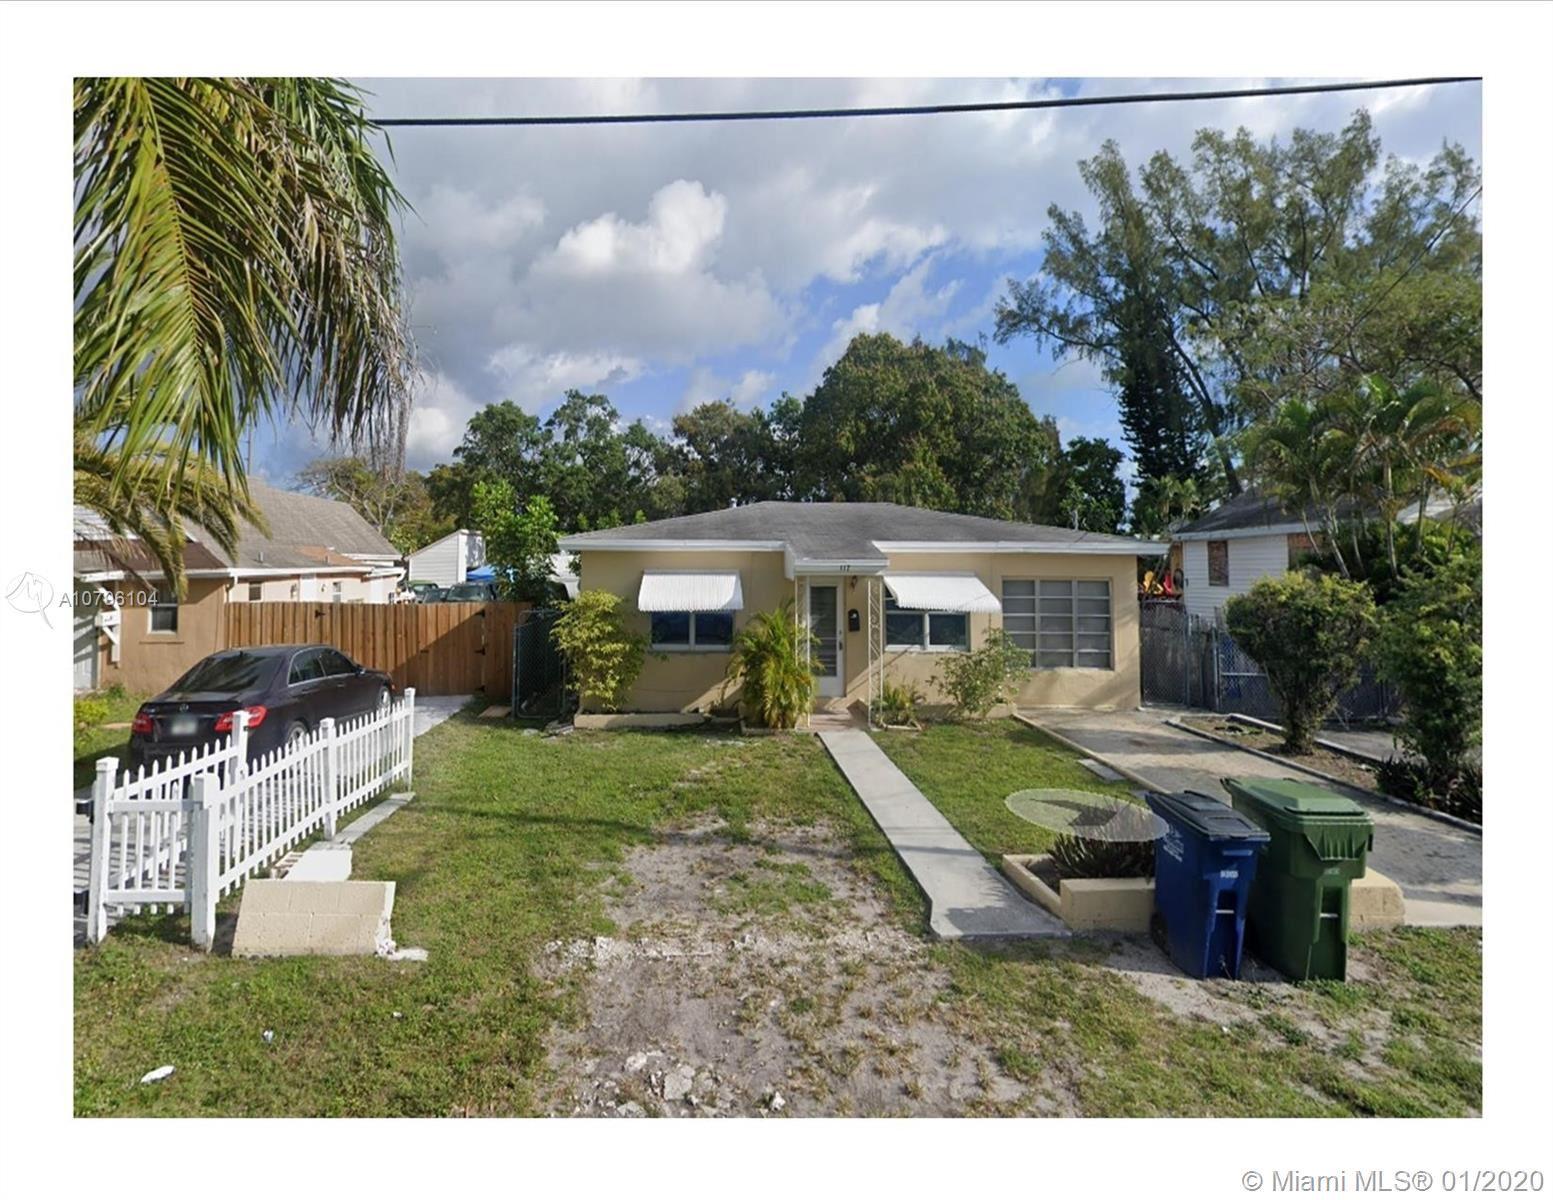 117 SE 4th St, Hallandale Beach, FL 33009 - #: A10796104